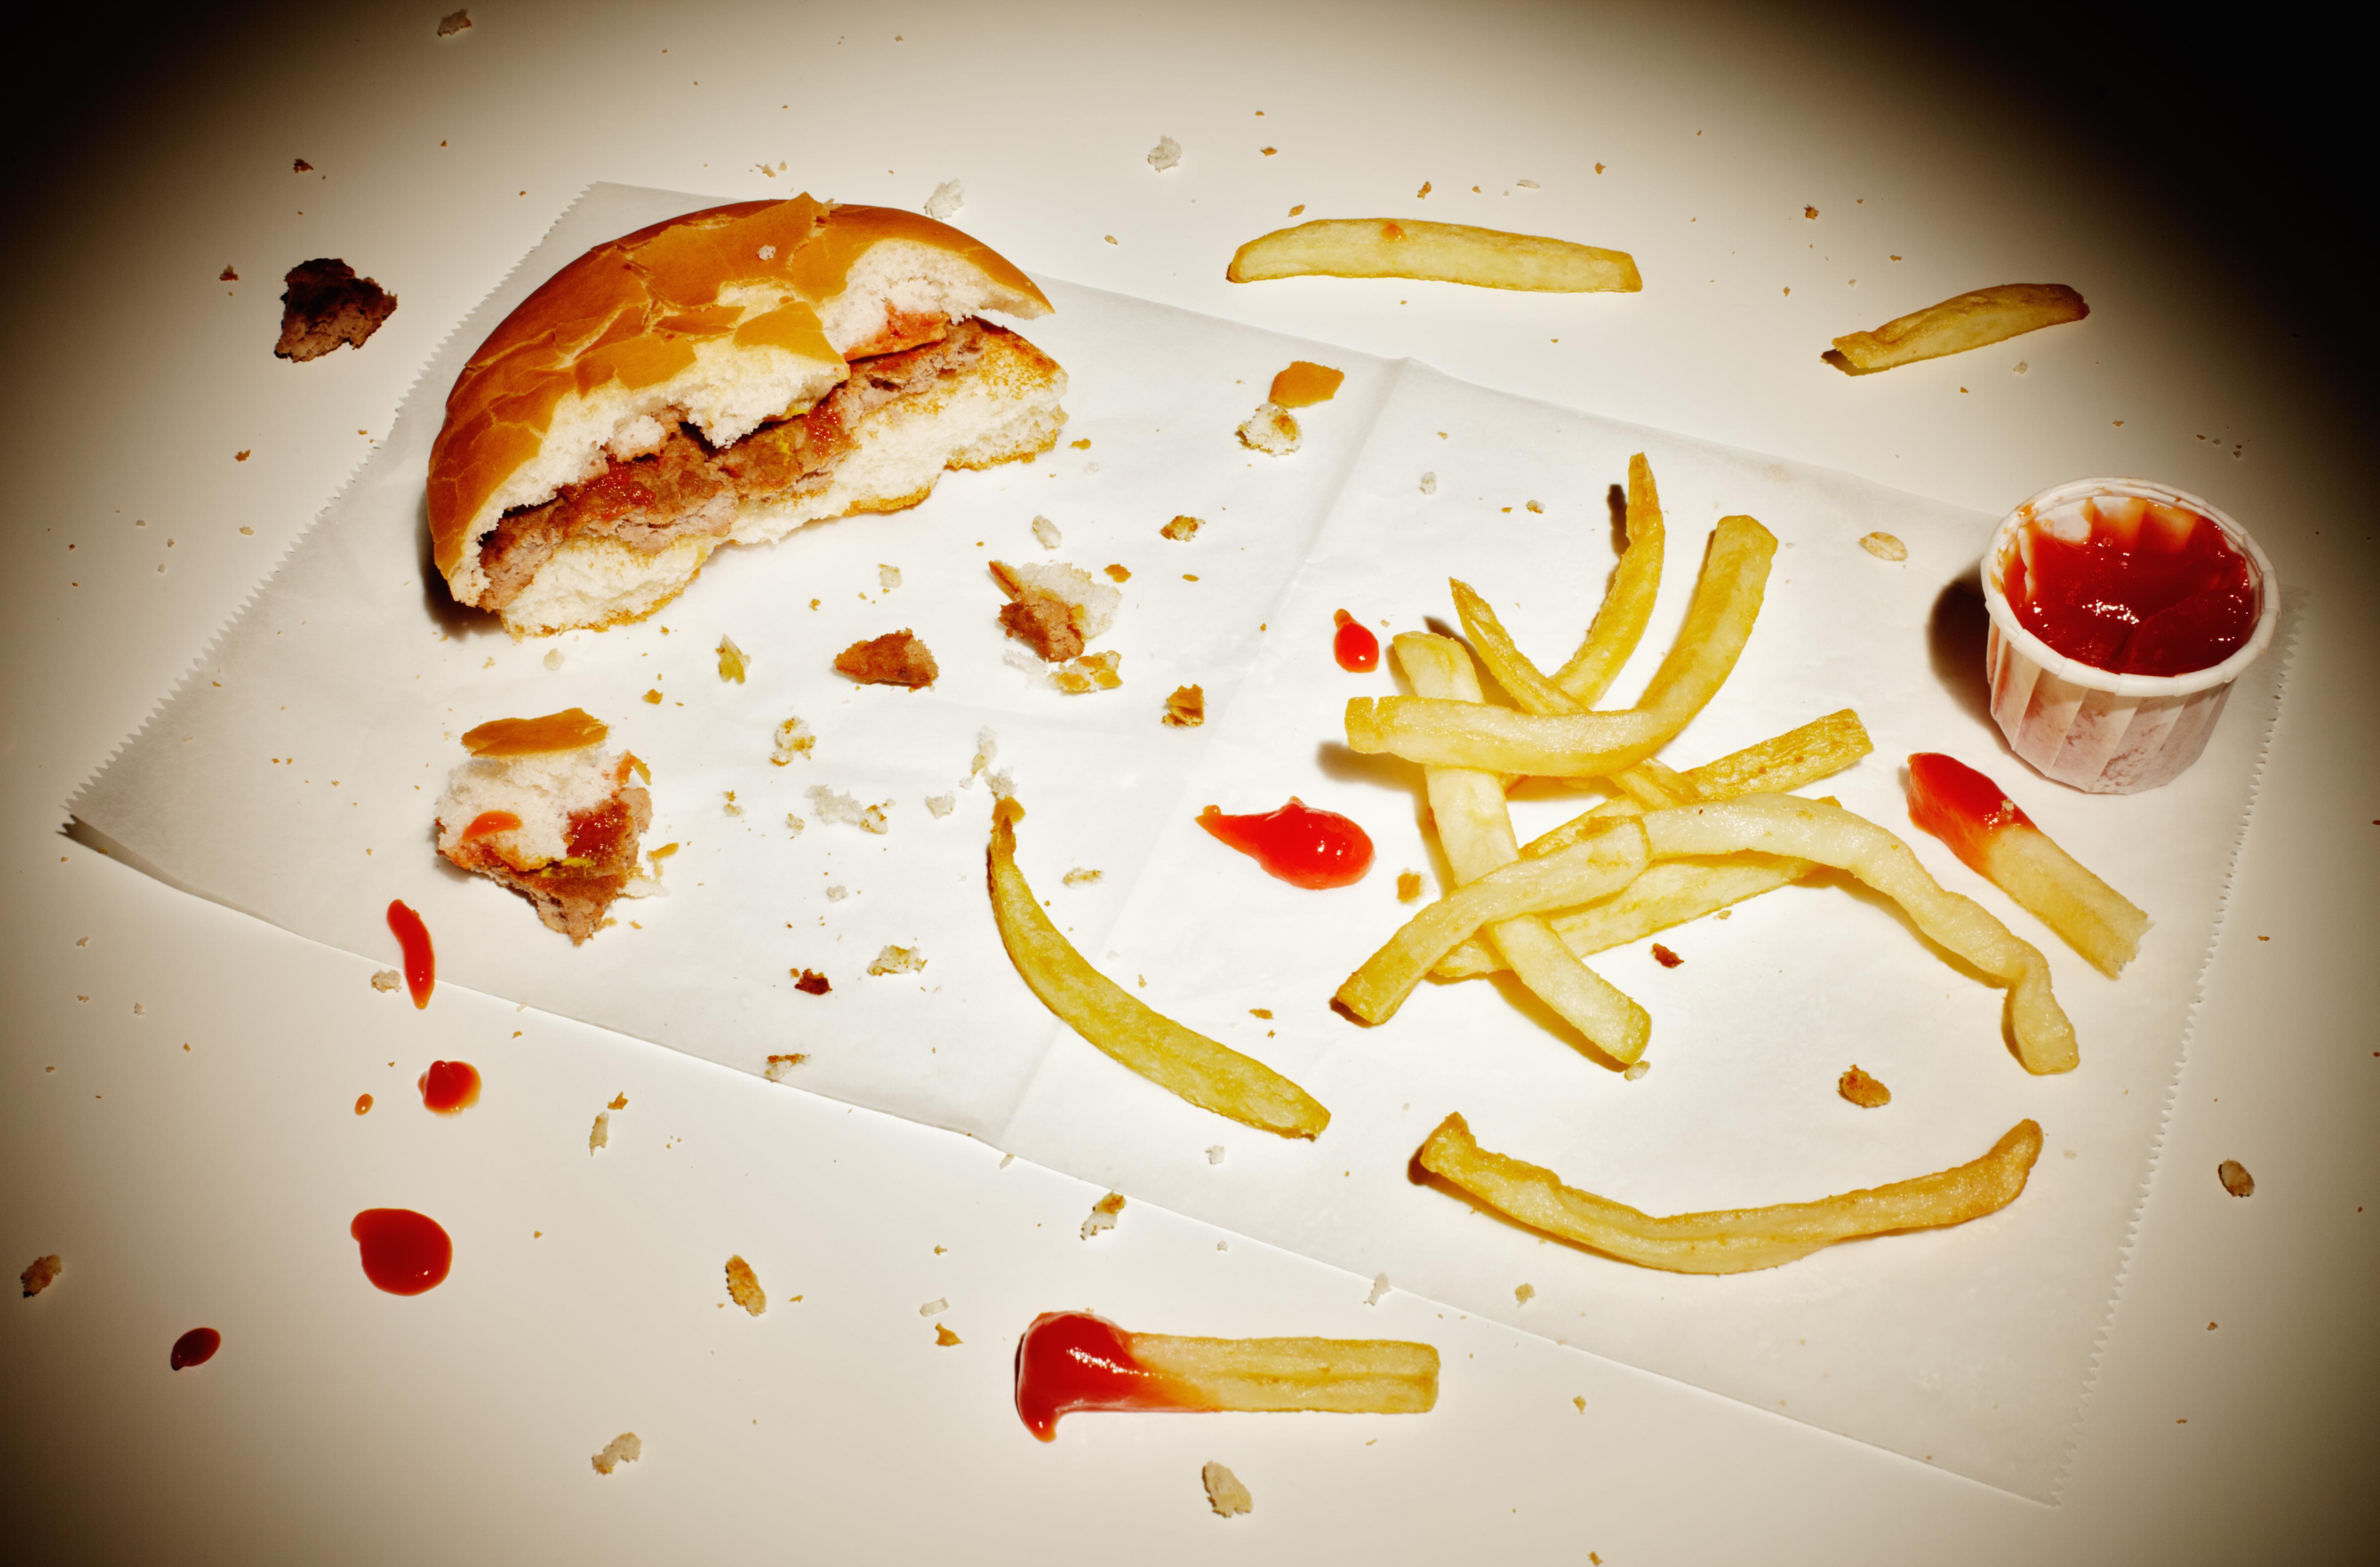 Half eaten burger and fries.